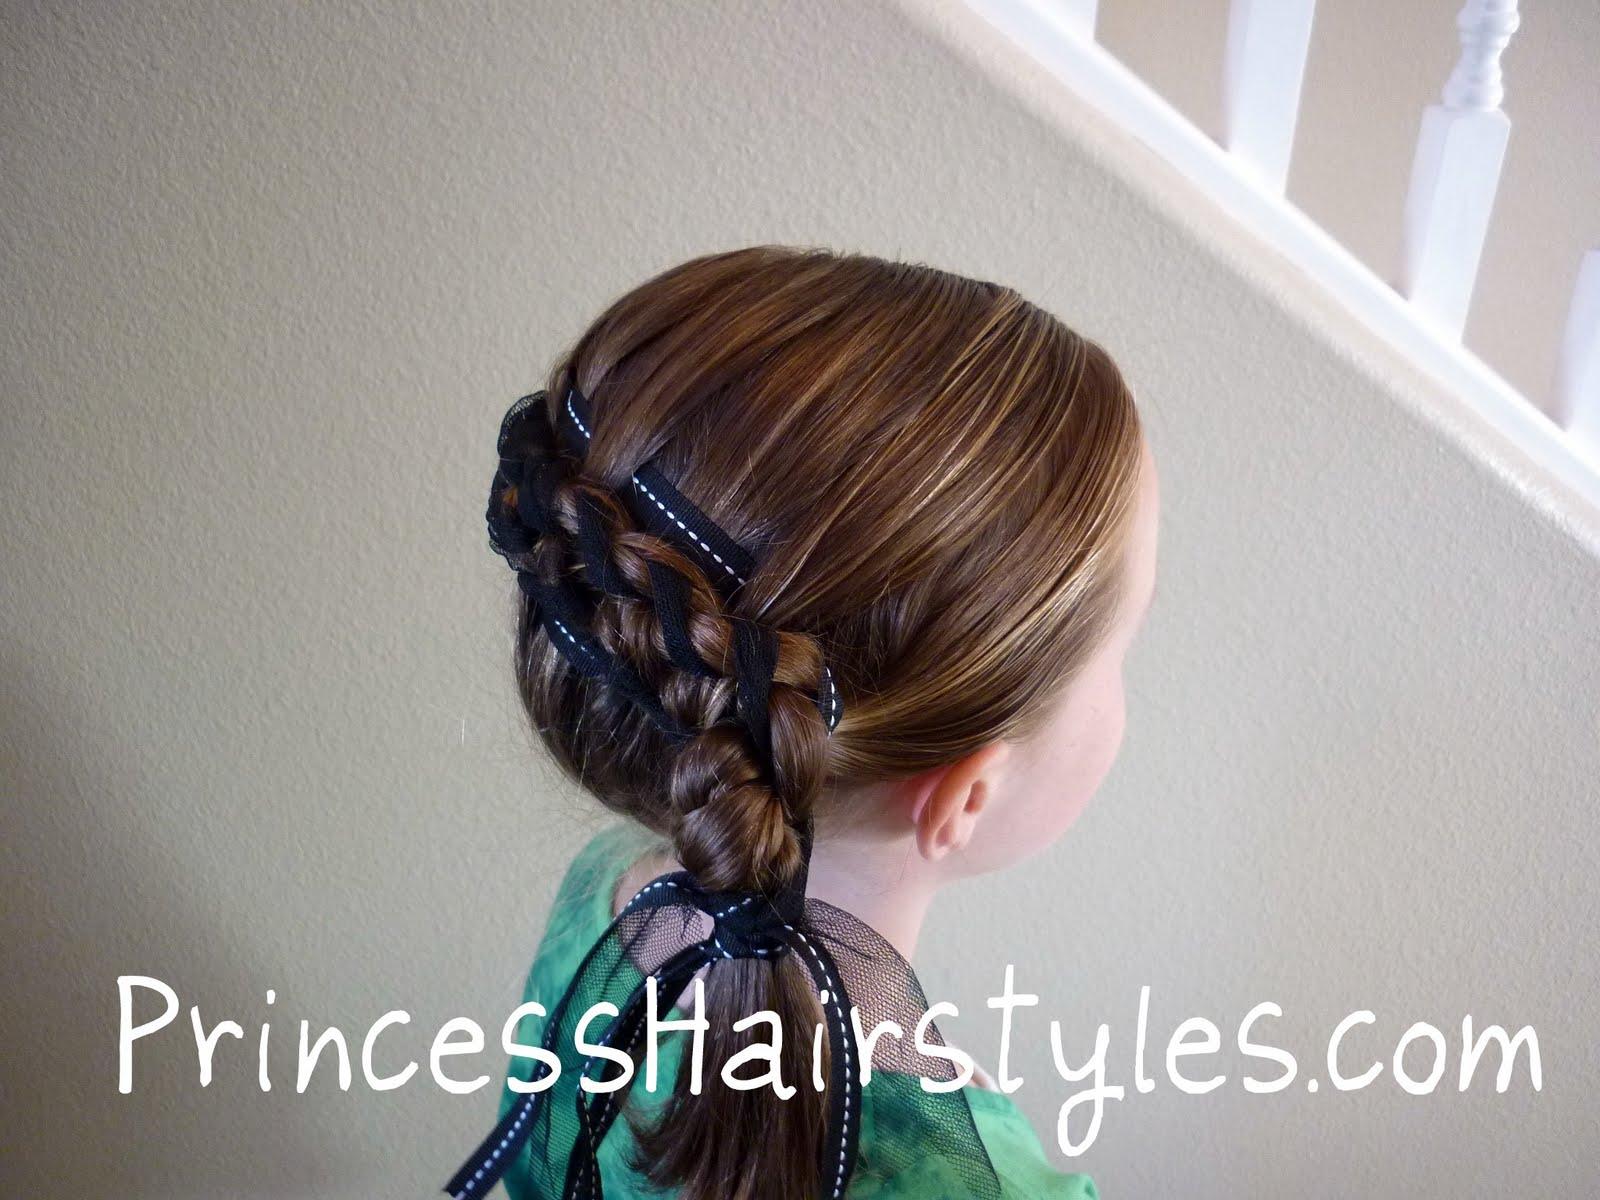 Wondrous Ribbon Braid Design Scunci Design Weaver Hairstyles For Girls Short Hairstyles For Black Women Fulllsitofus